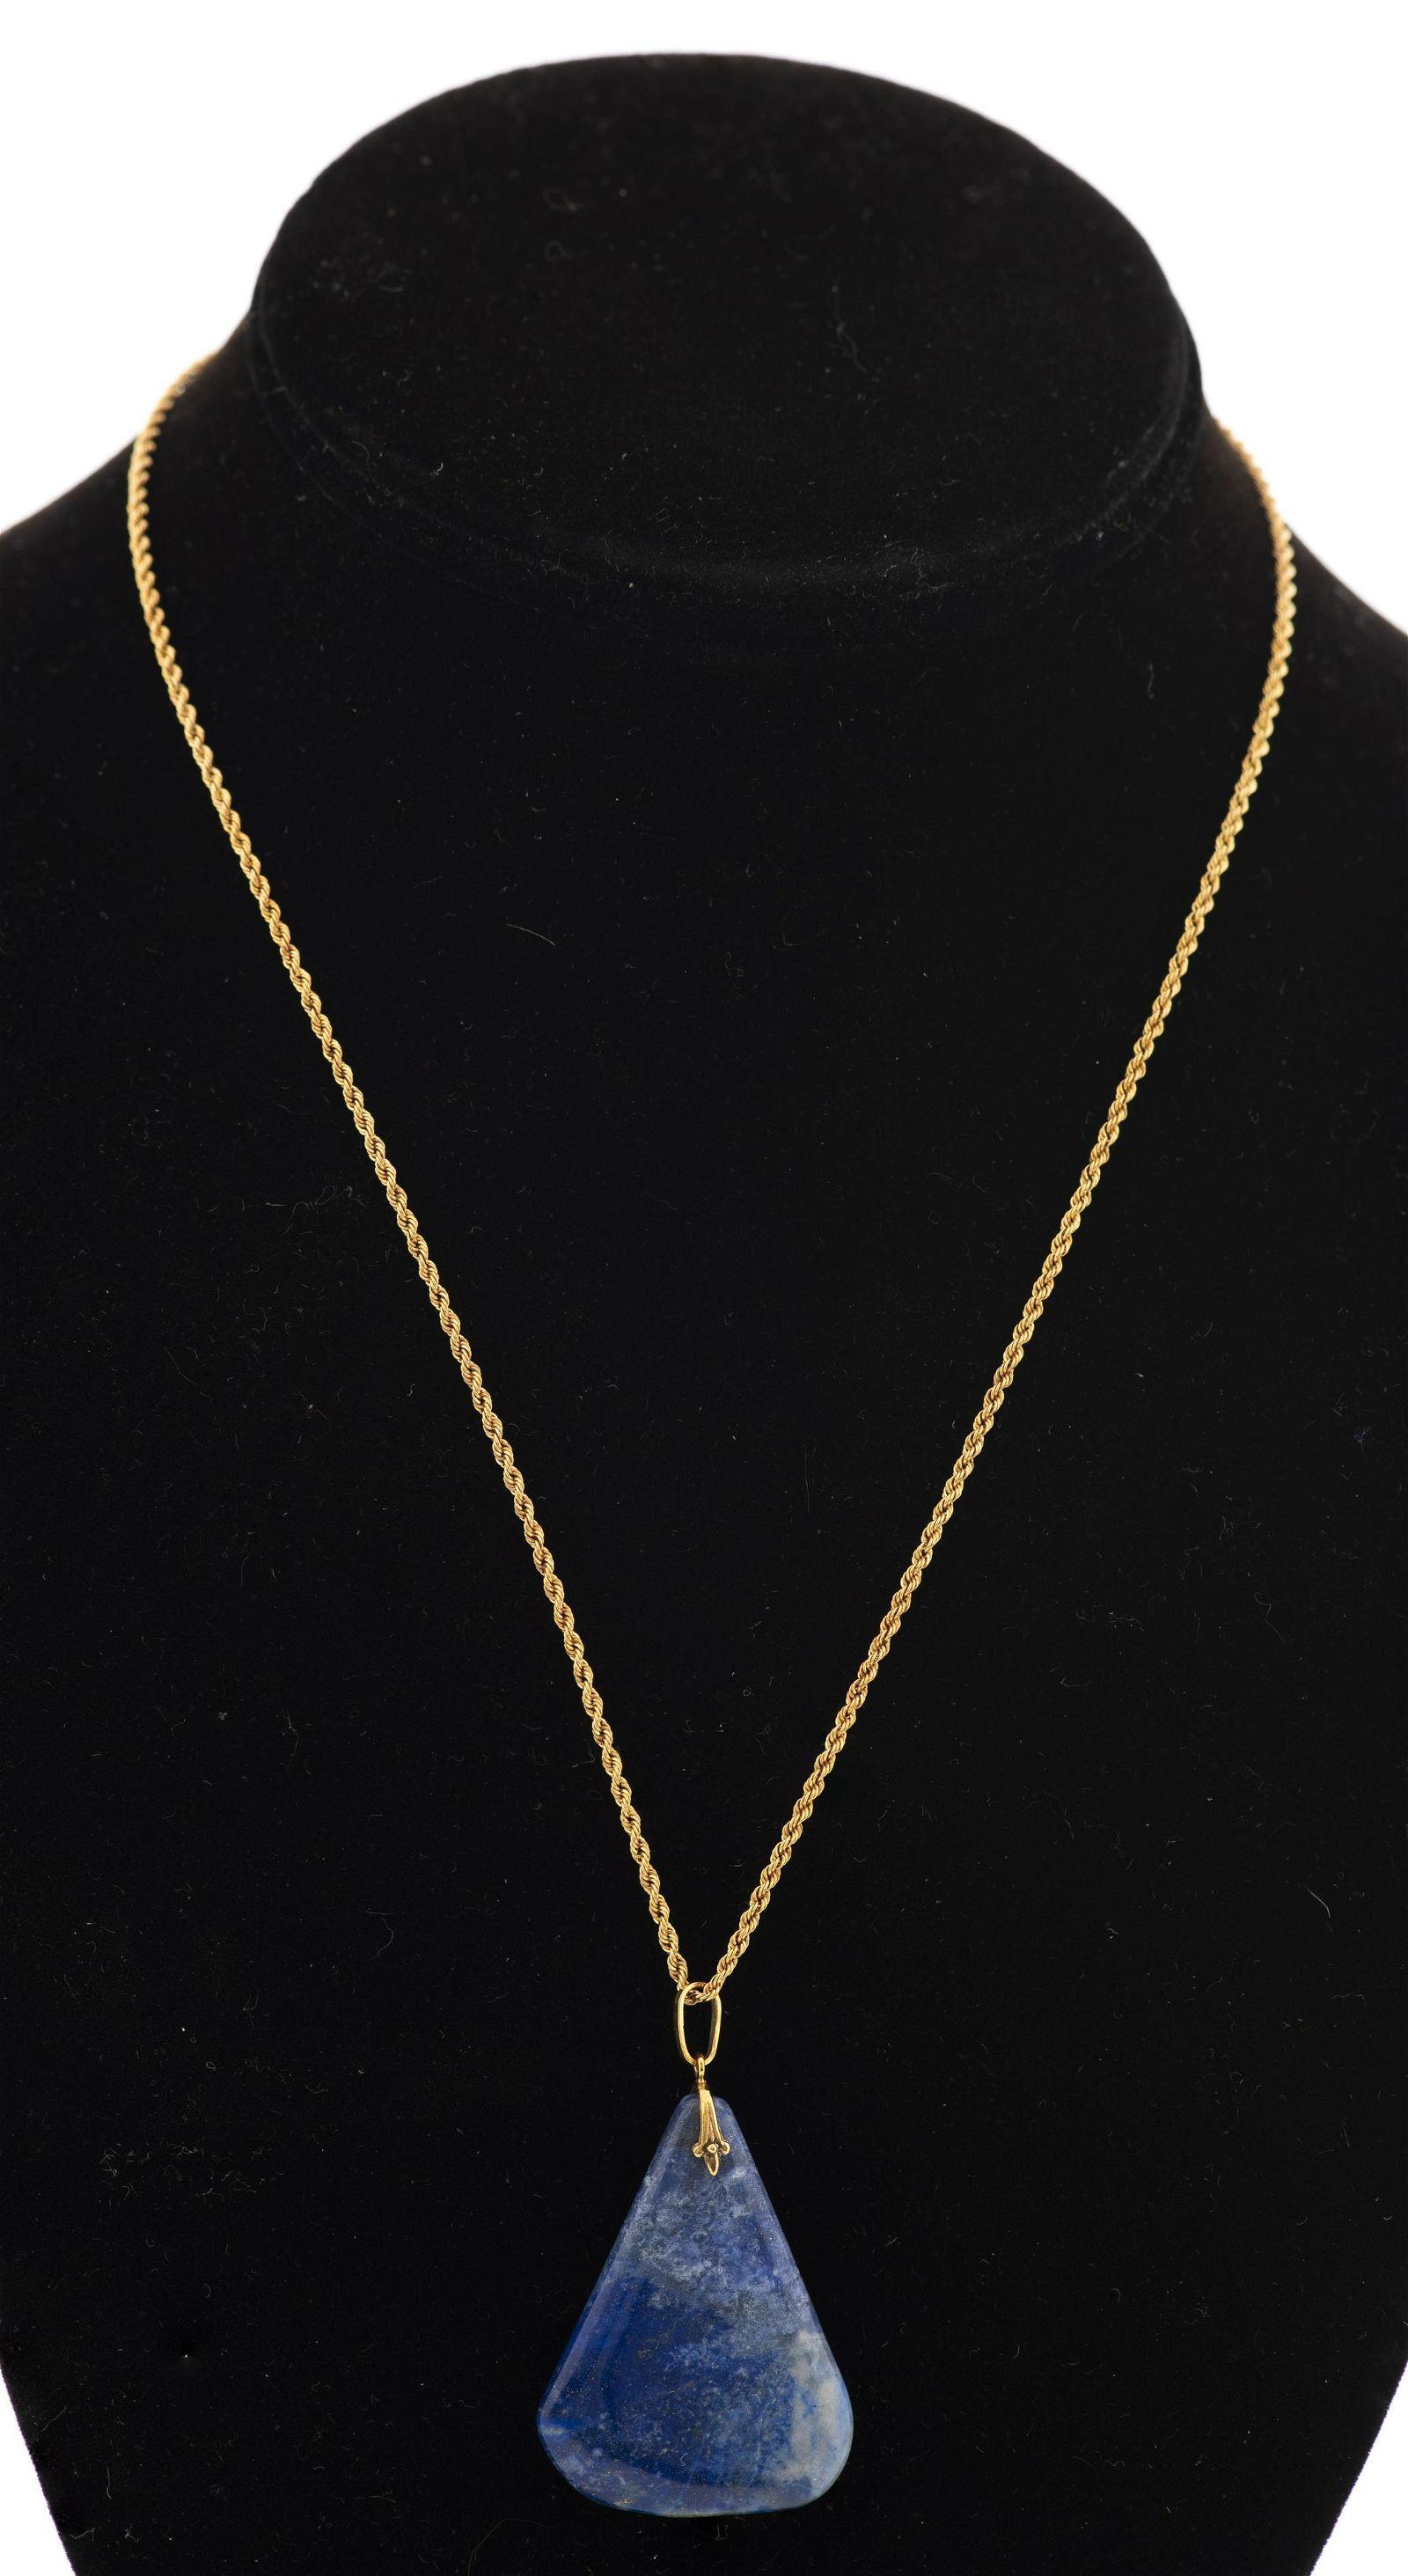 14K Yellow Gold Lapis Lazuli Pendant Necklace